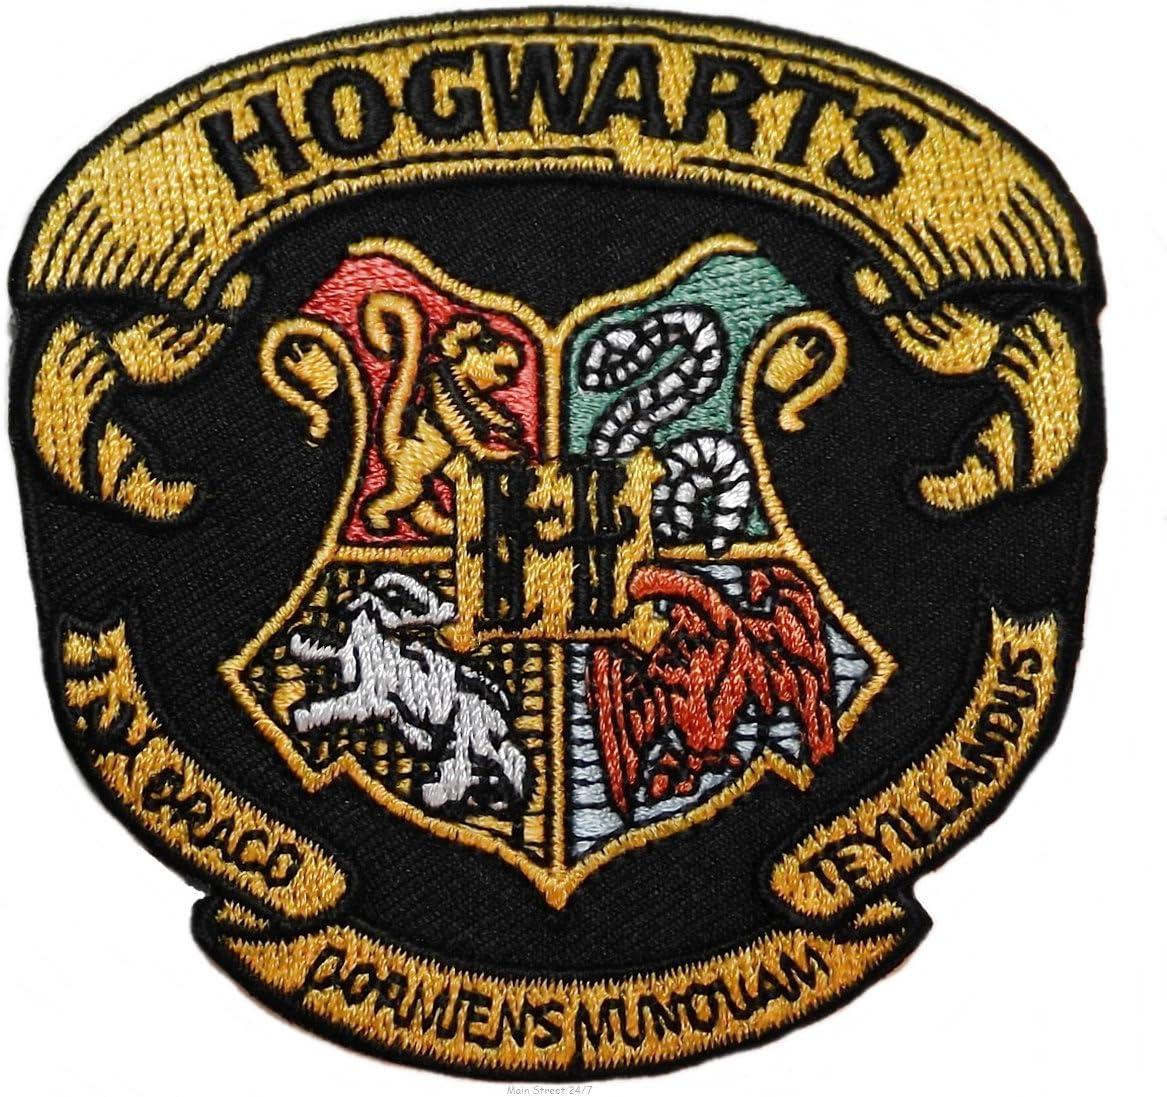 BTY Harry Potter licensed fabric hogwarts house crests